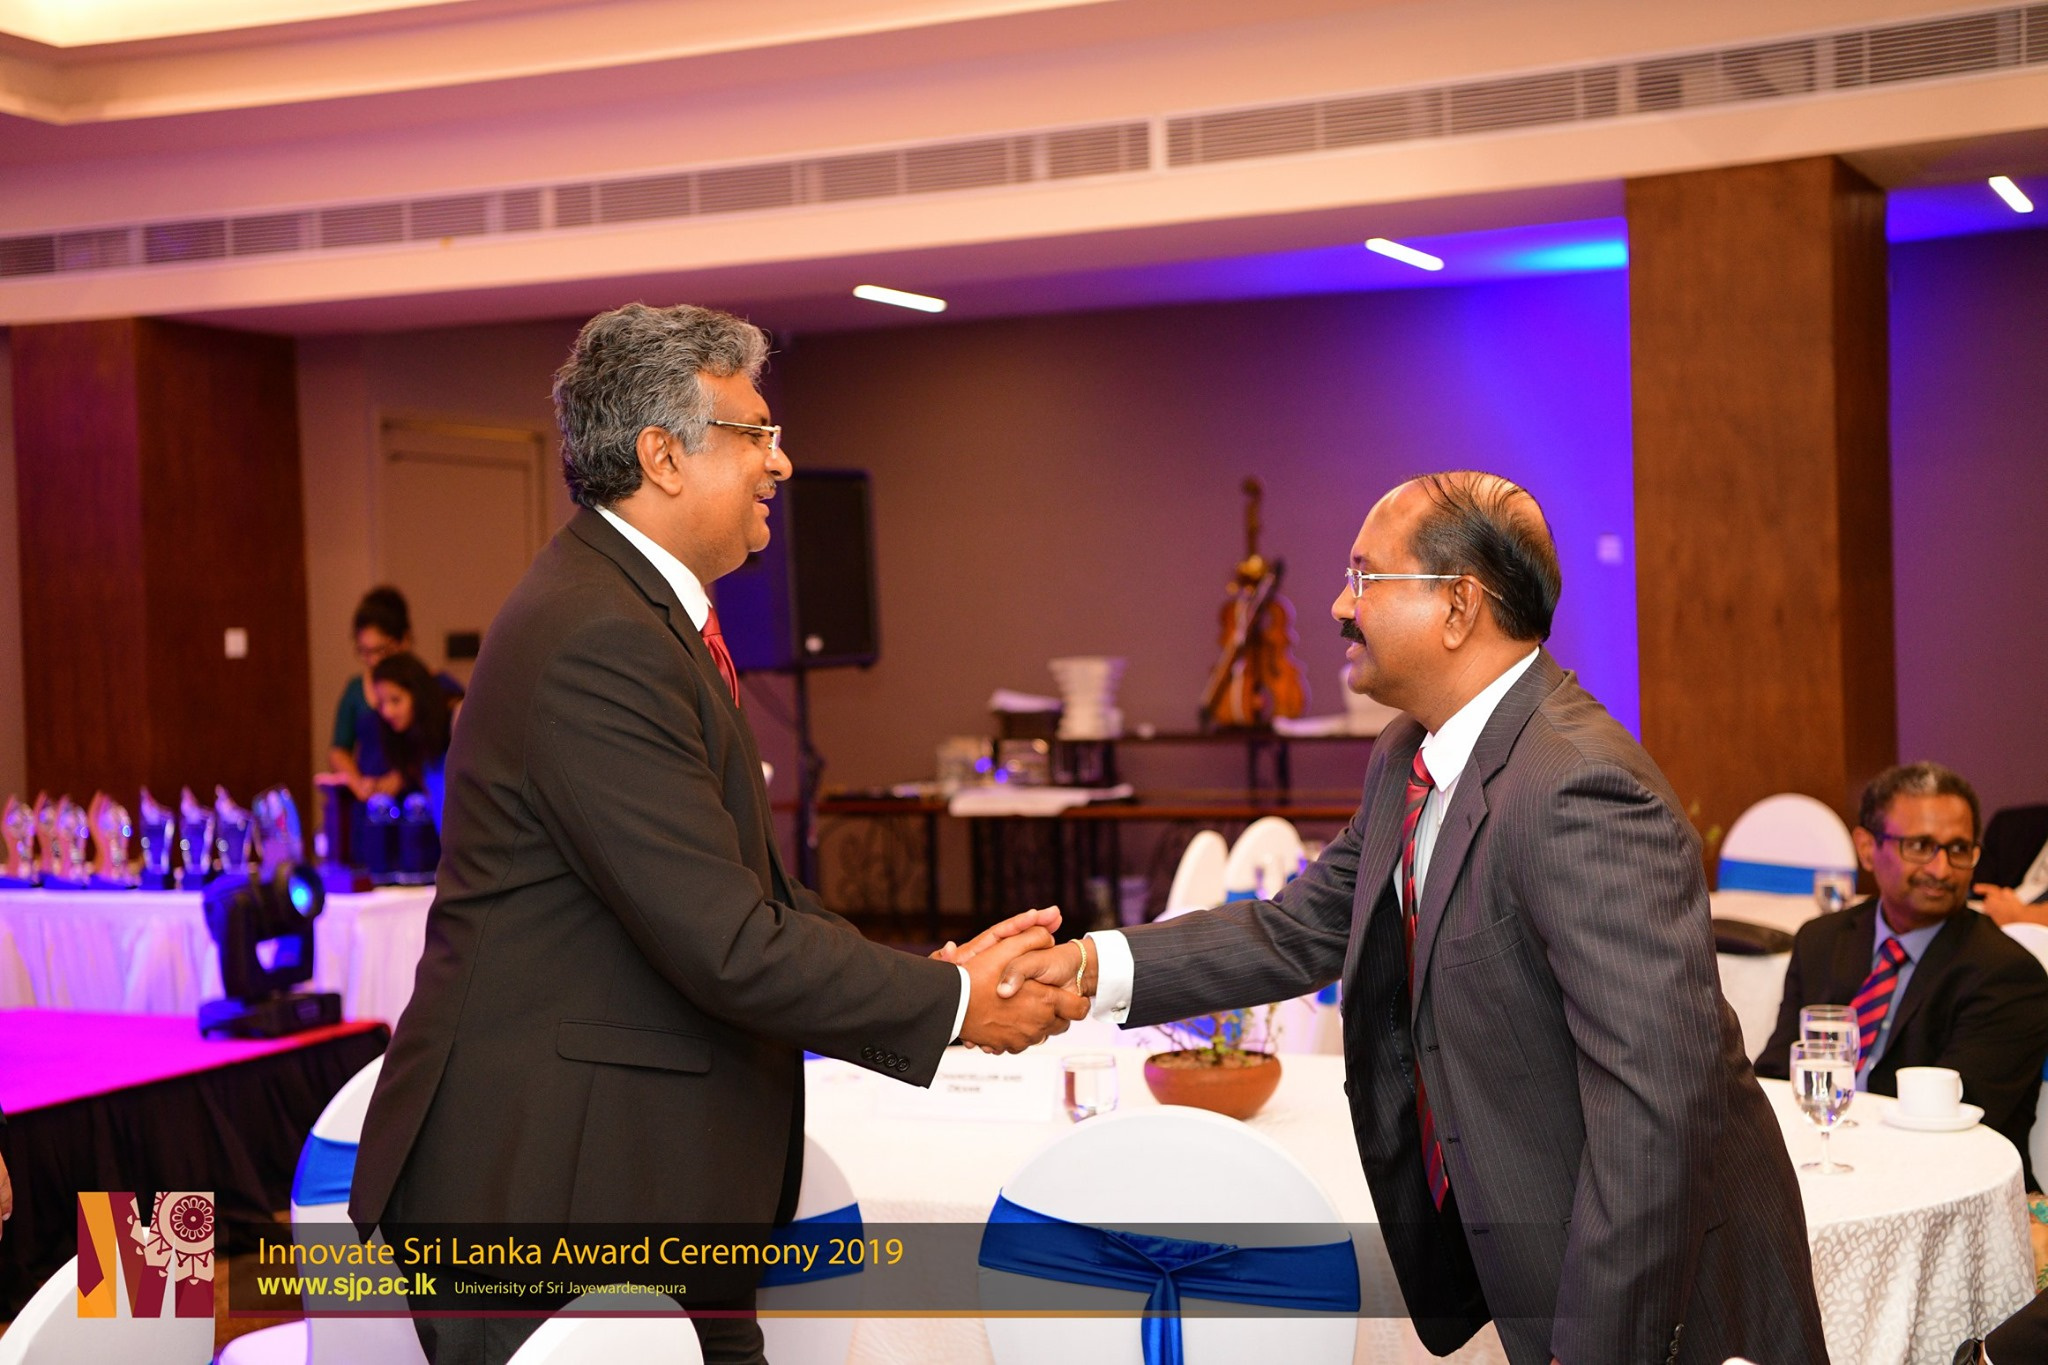 Innovate Sri Lanka Award Ceremony 2019 (128) - University of